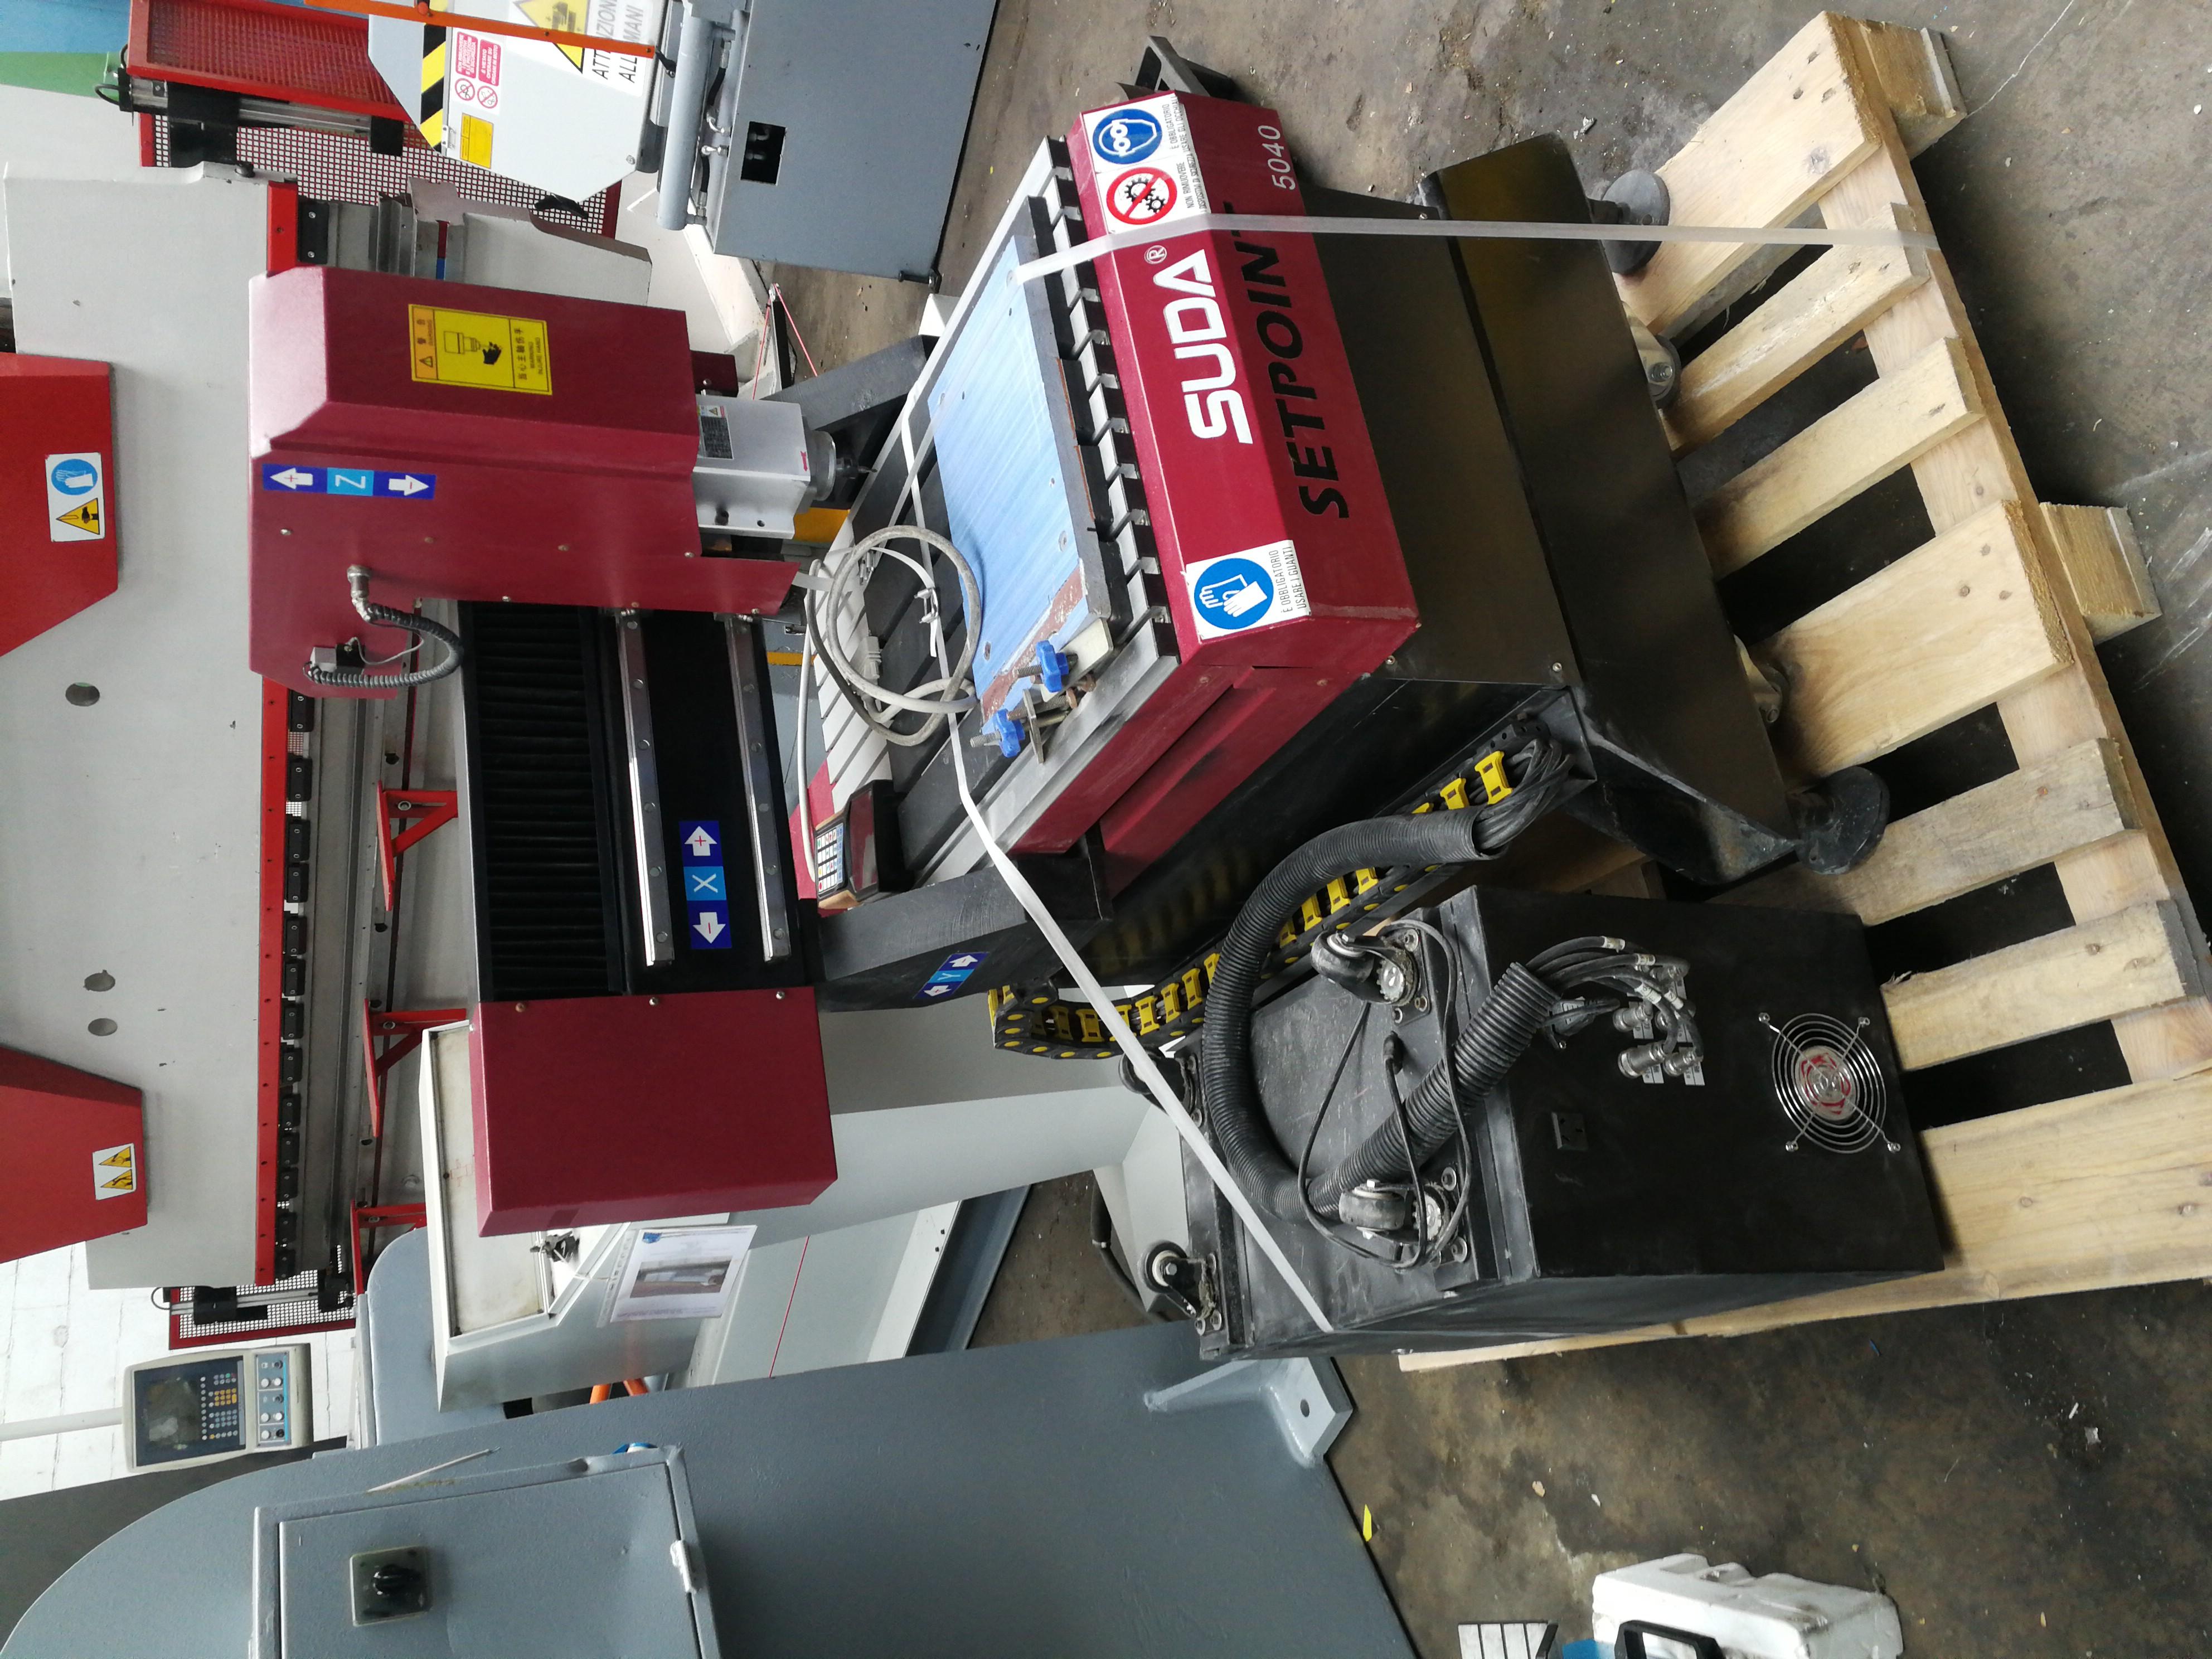 MICRO-FRESATRICE CNC SETPOINT SUDA 5040 in vendita - foto 1